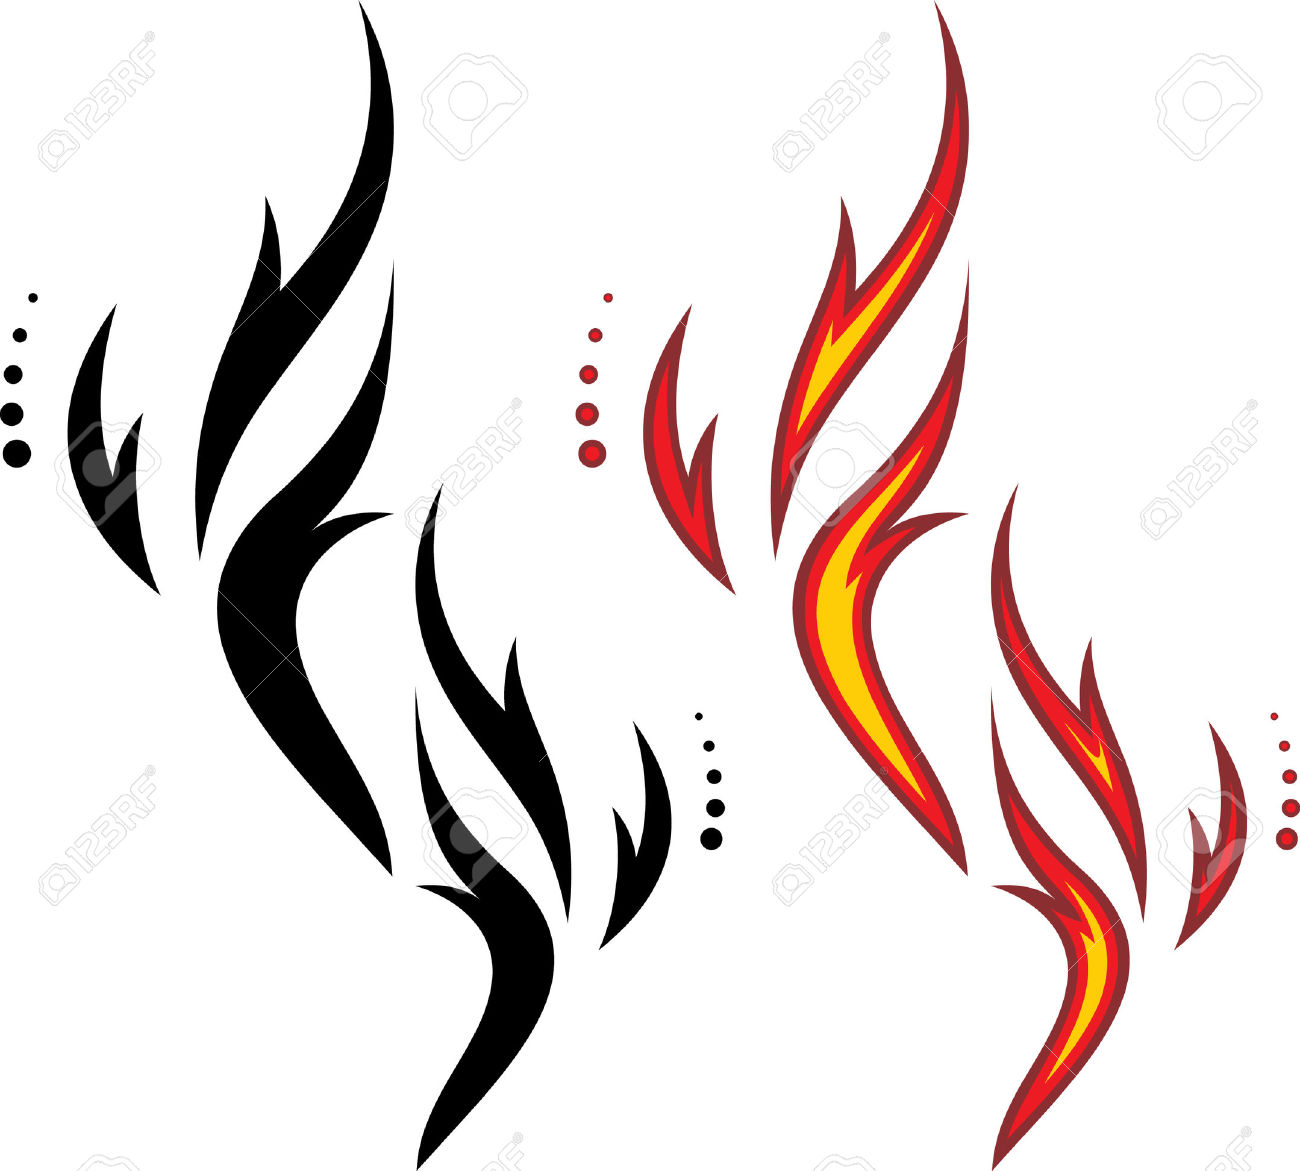 Fire Vector Black